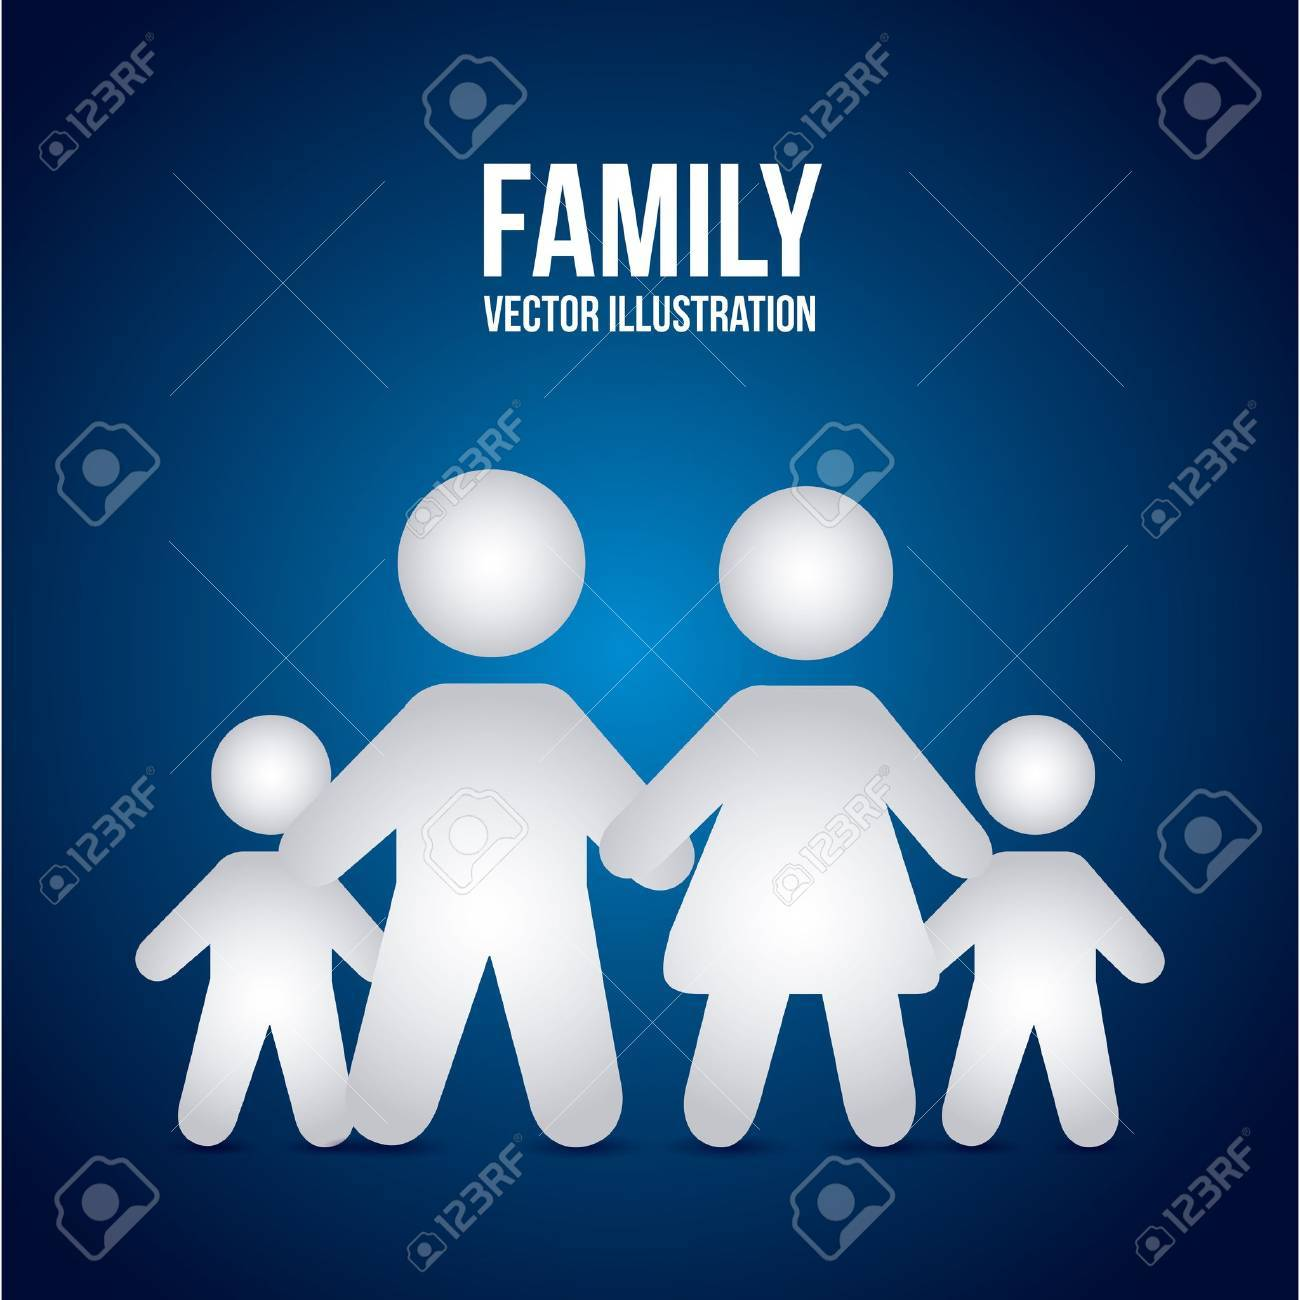 family design over blue background Stock Vector - 21287092